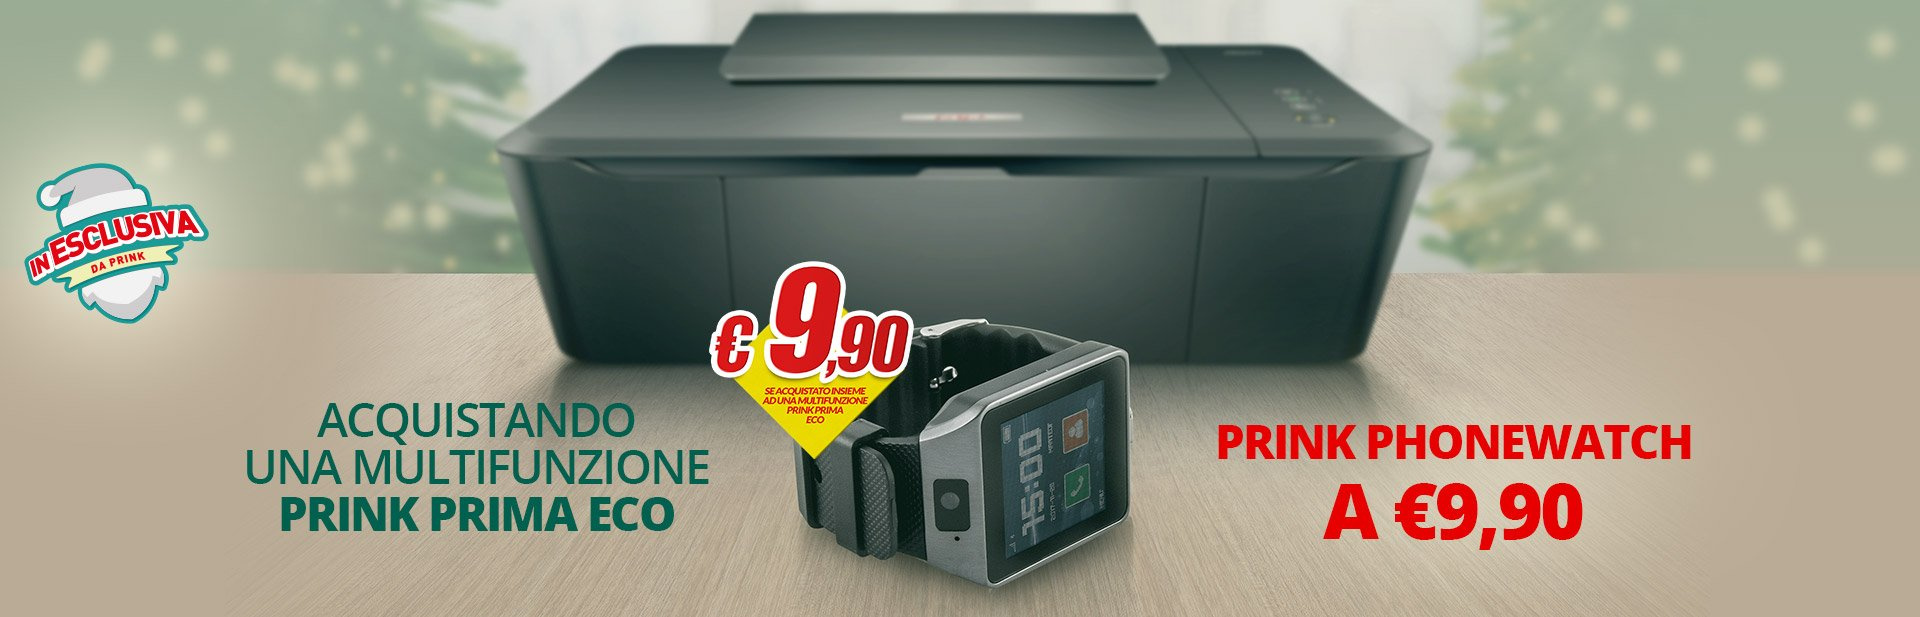 bundle-stampante-phonewatch-Prink-SL